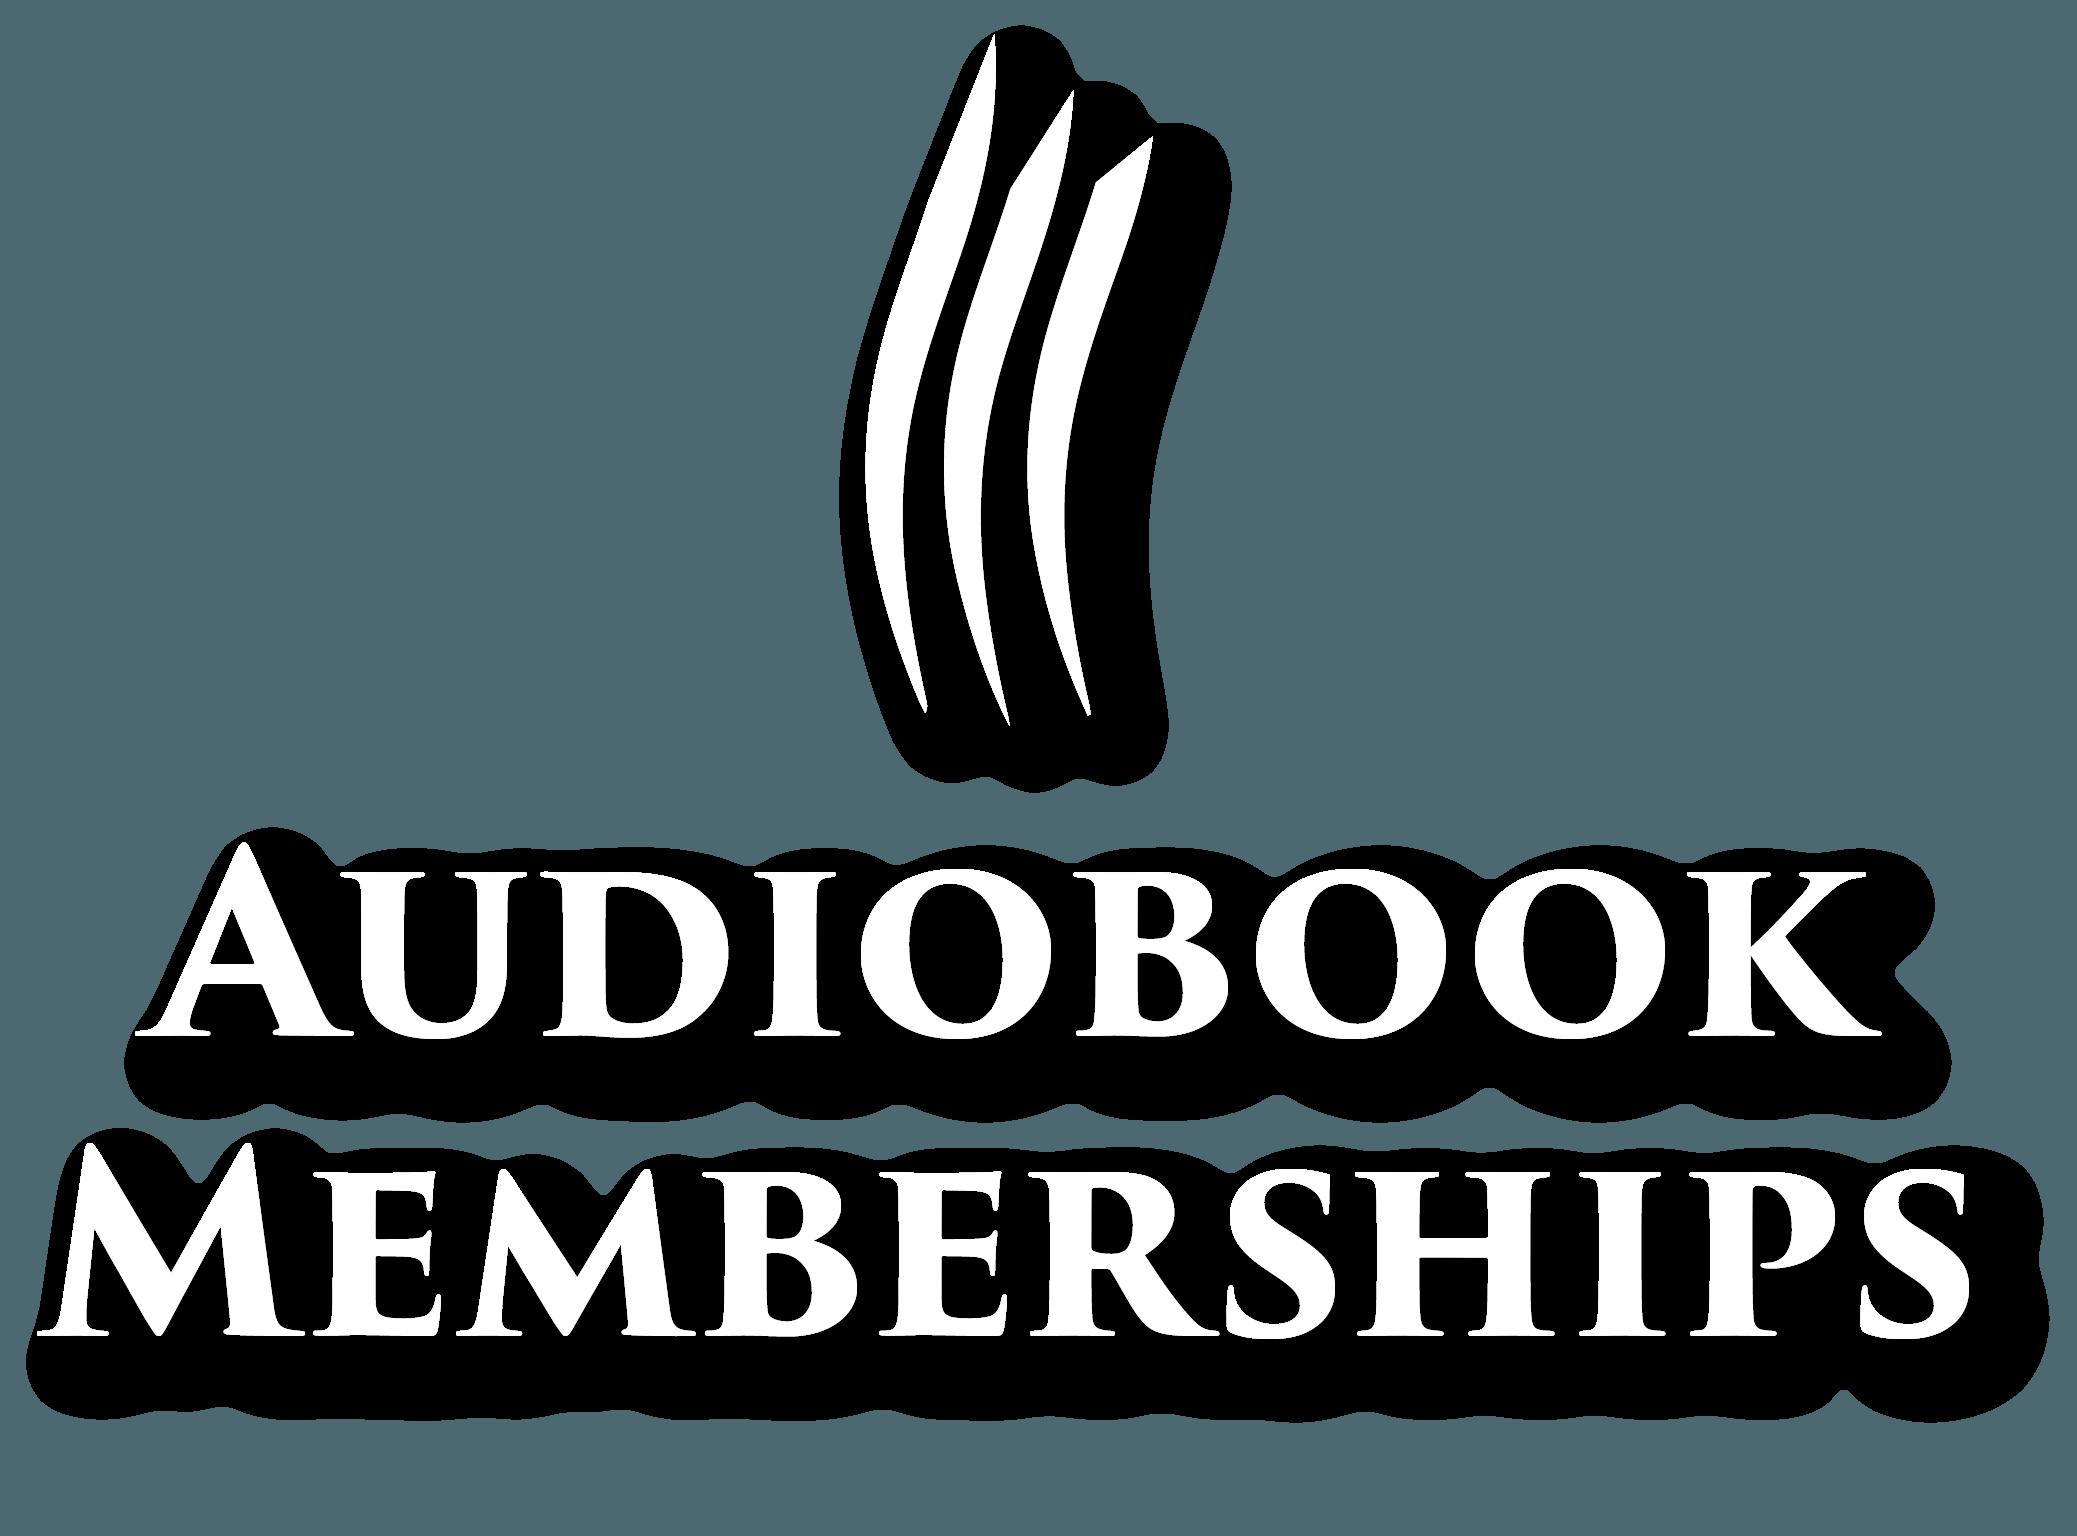 Audiobook@300x-8.png